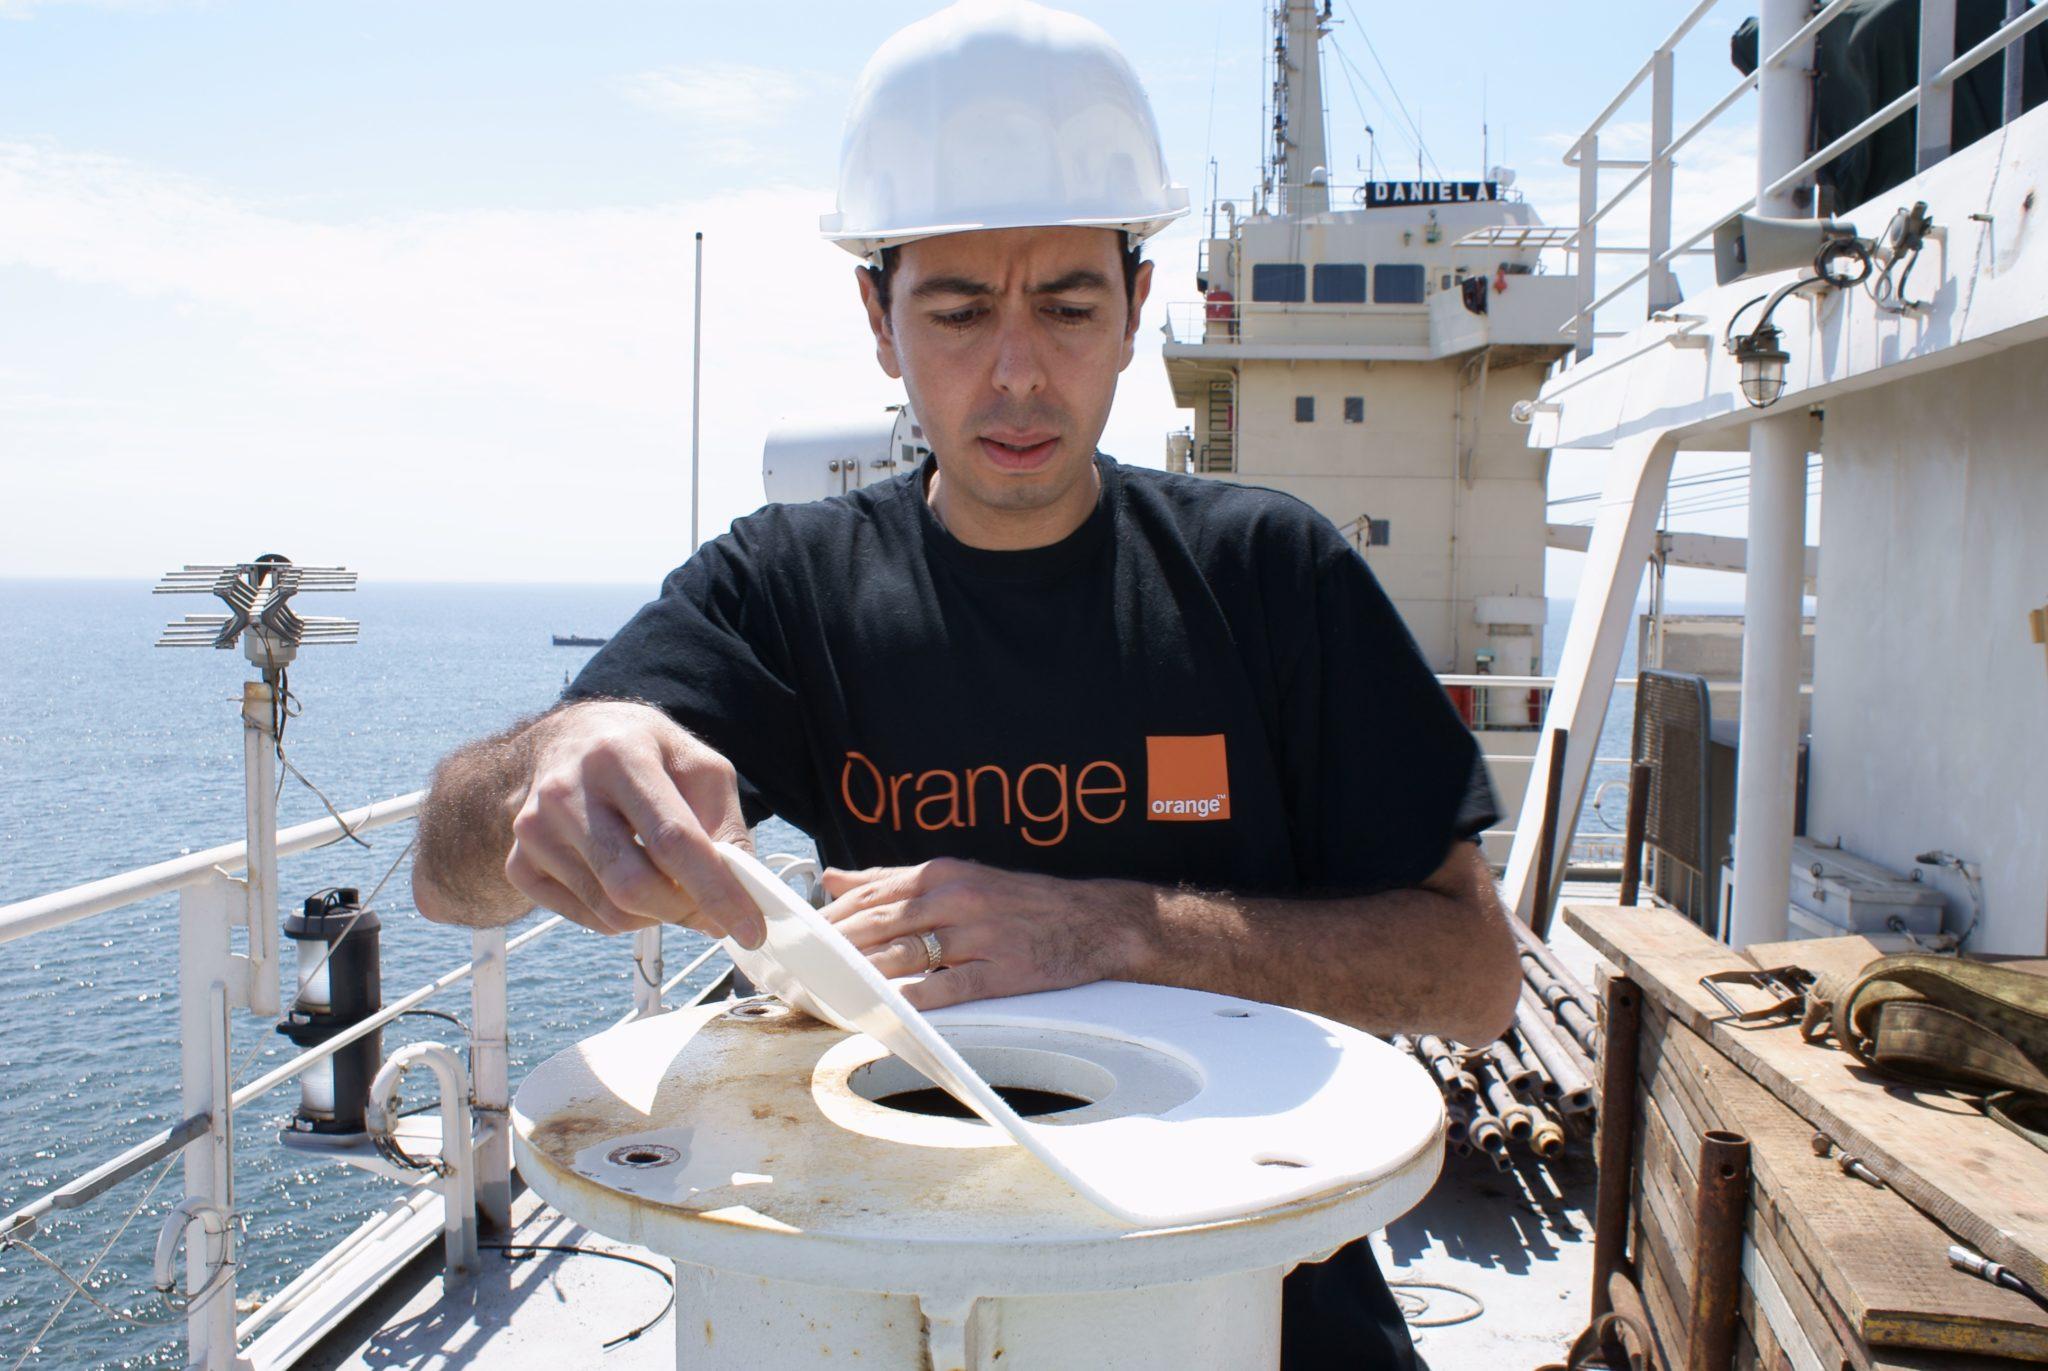 Orange engineer installs network equipment on board.